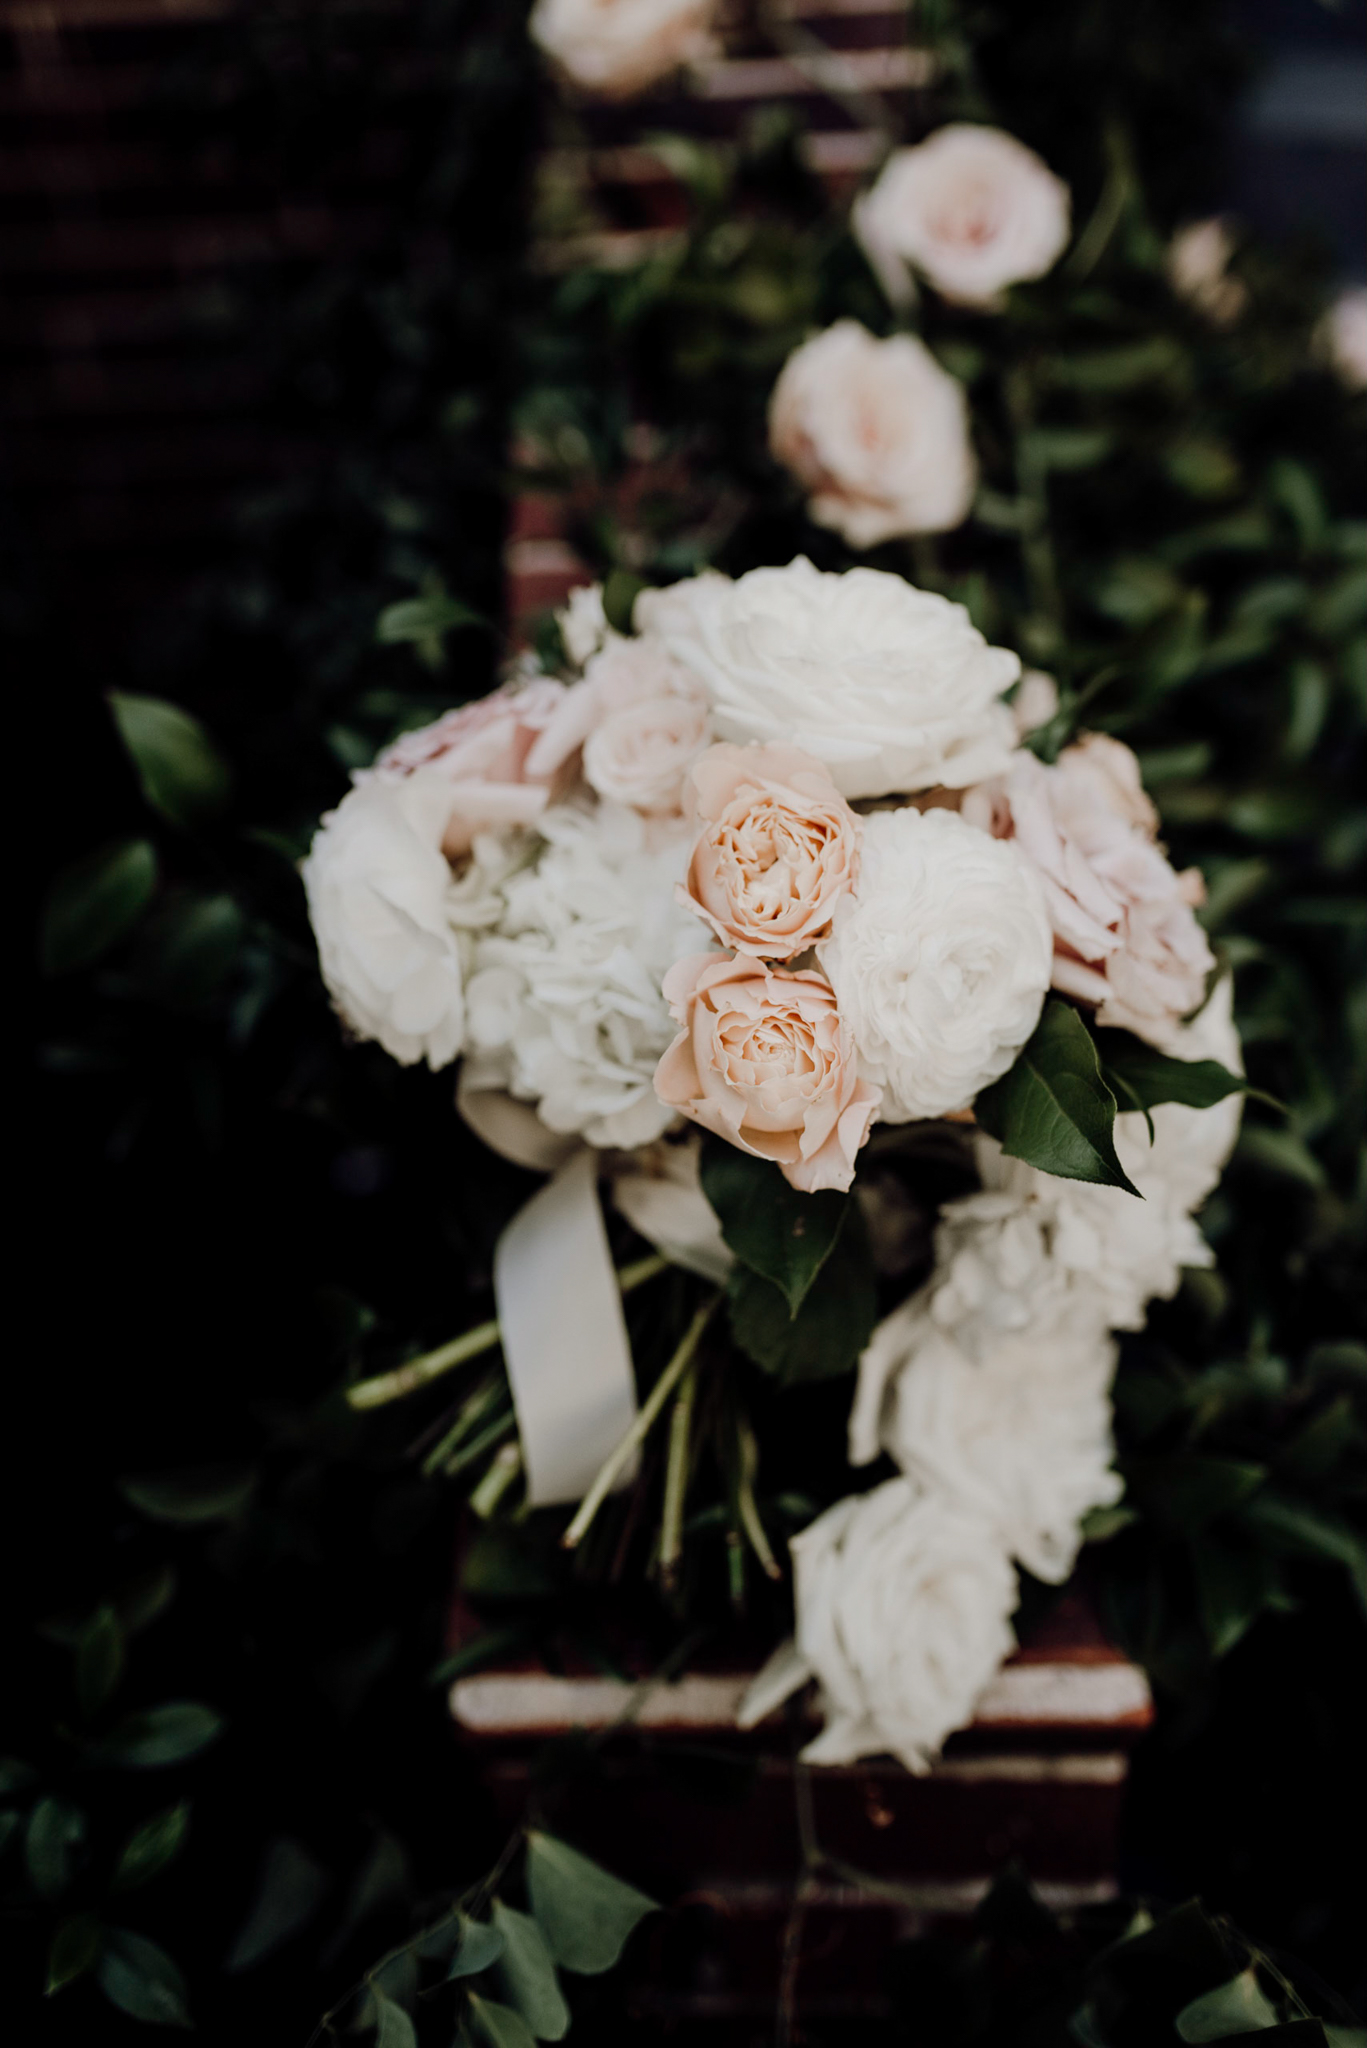 Houston Wedding Photographer-Intimate Texas Backyard Wedding- Houston Wedding Photographer -Kristen Giles Photography-17.jpg